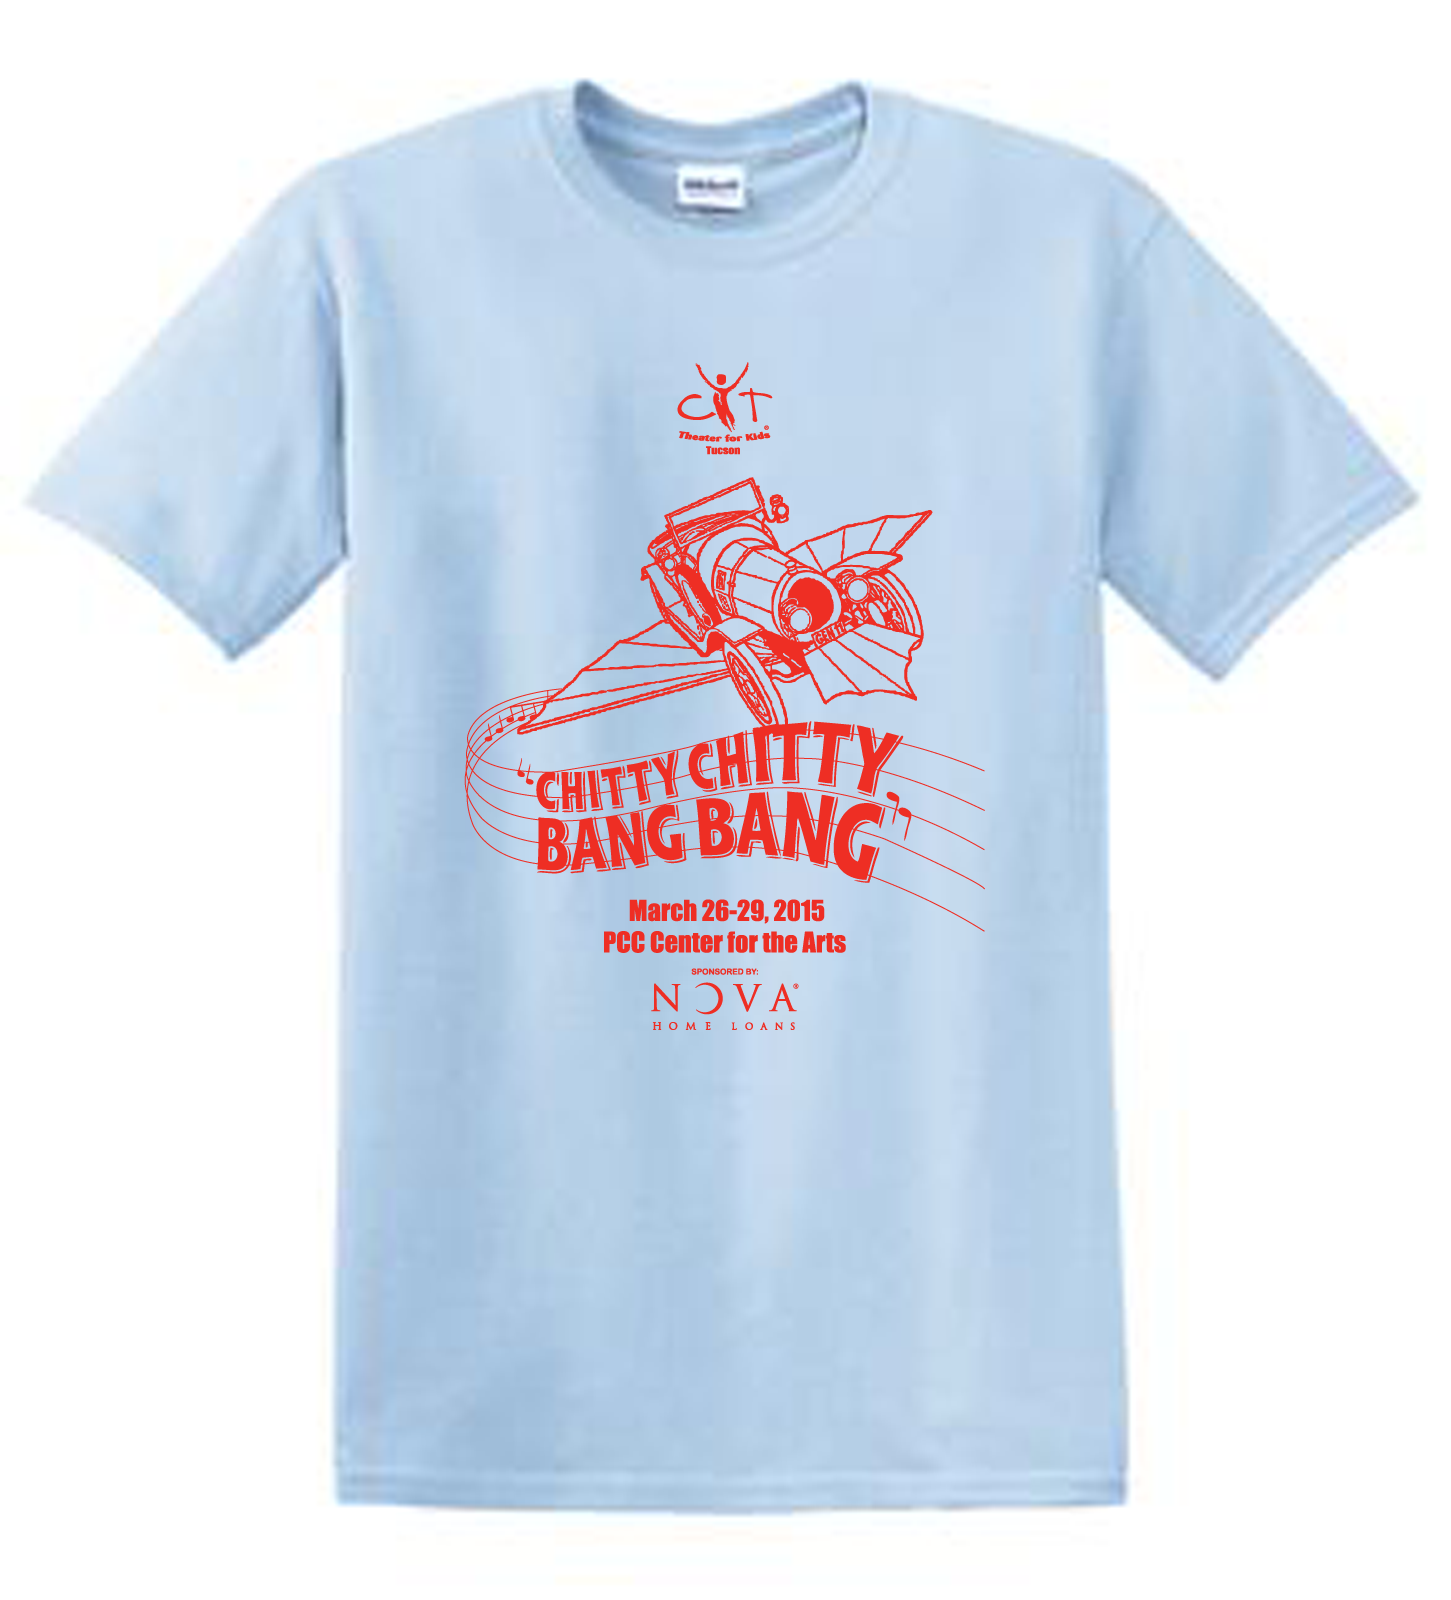 Chitty chitty bang bang t shirt